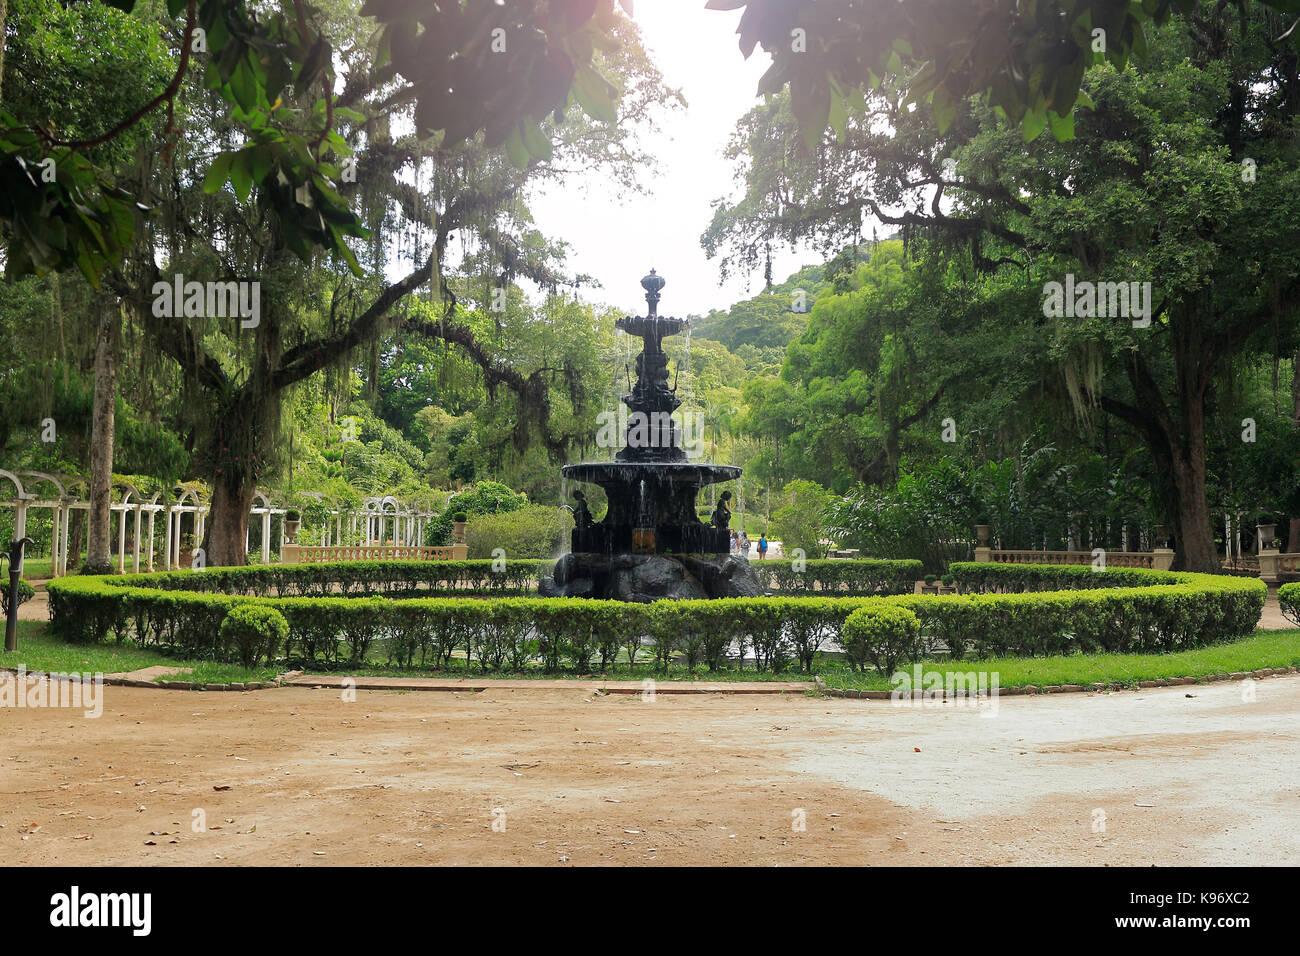 BOTANICAL GARDEN, RIO DE JANEIRO, BRAZIL - MARCH 15, 2016: Beautiful fountain surrounded by vegetation. Botanical Stock Photo